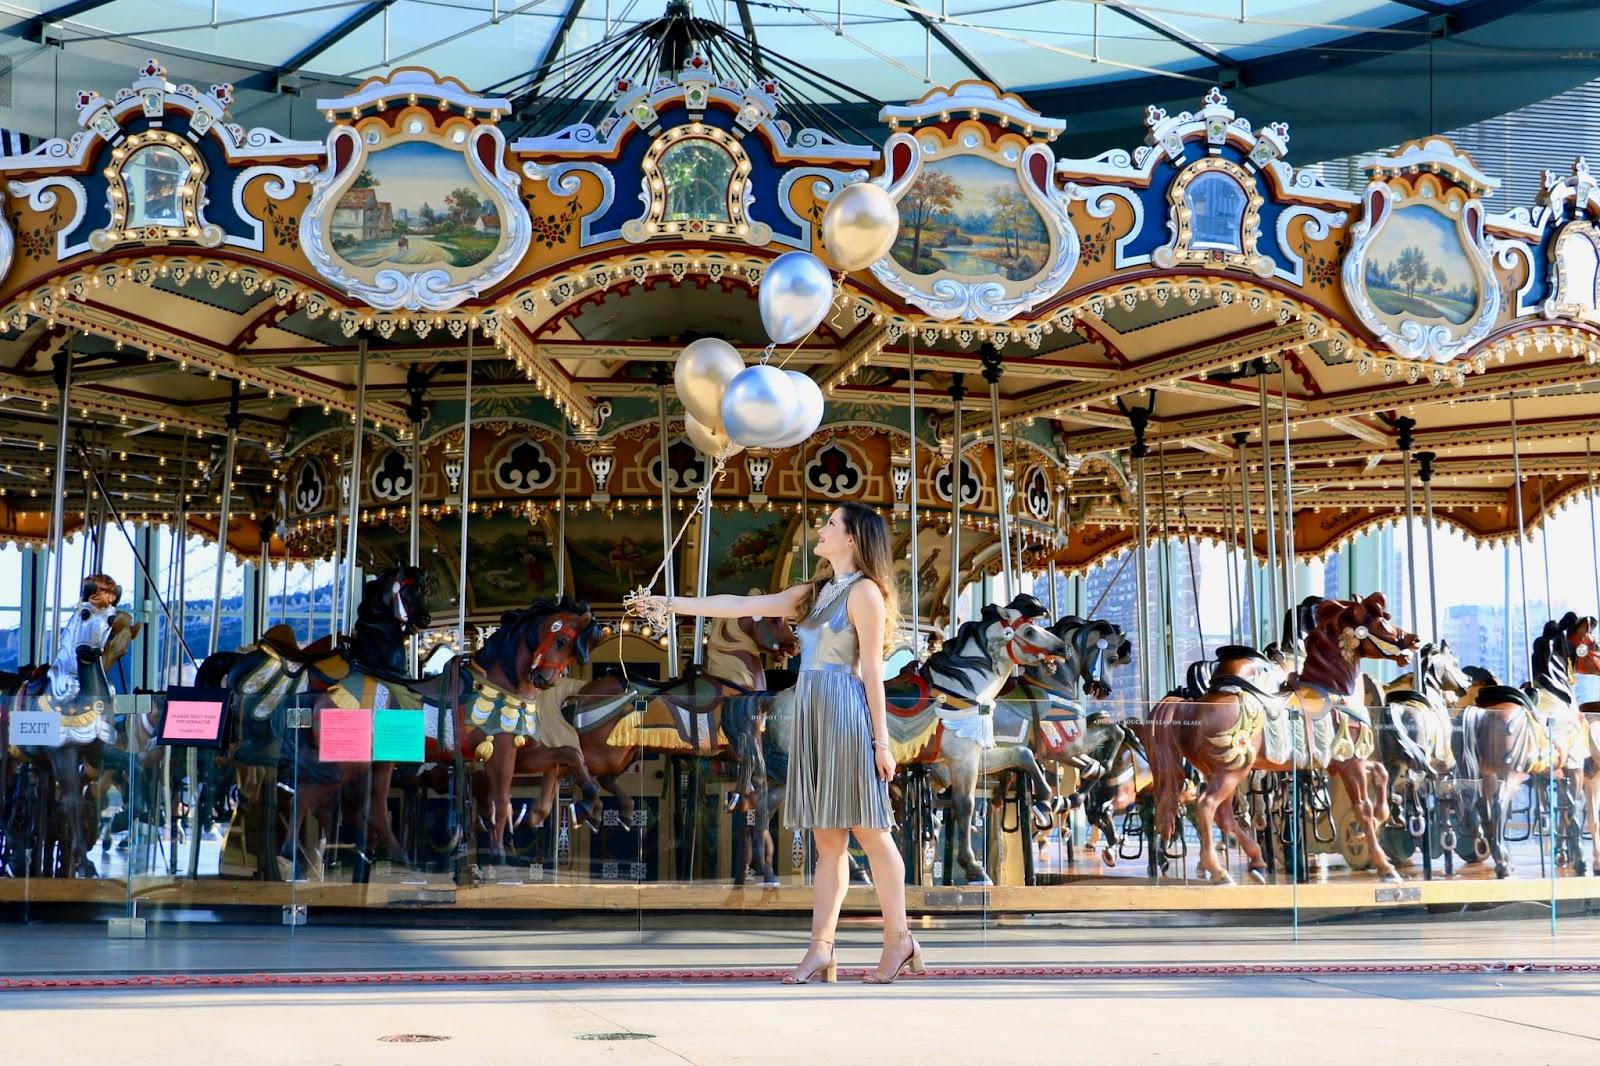 Nyc fashion blogger Kathleen Harper's Jane's Carousel pics